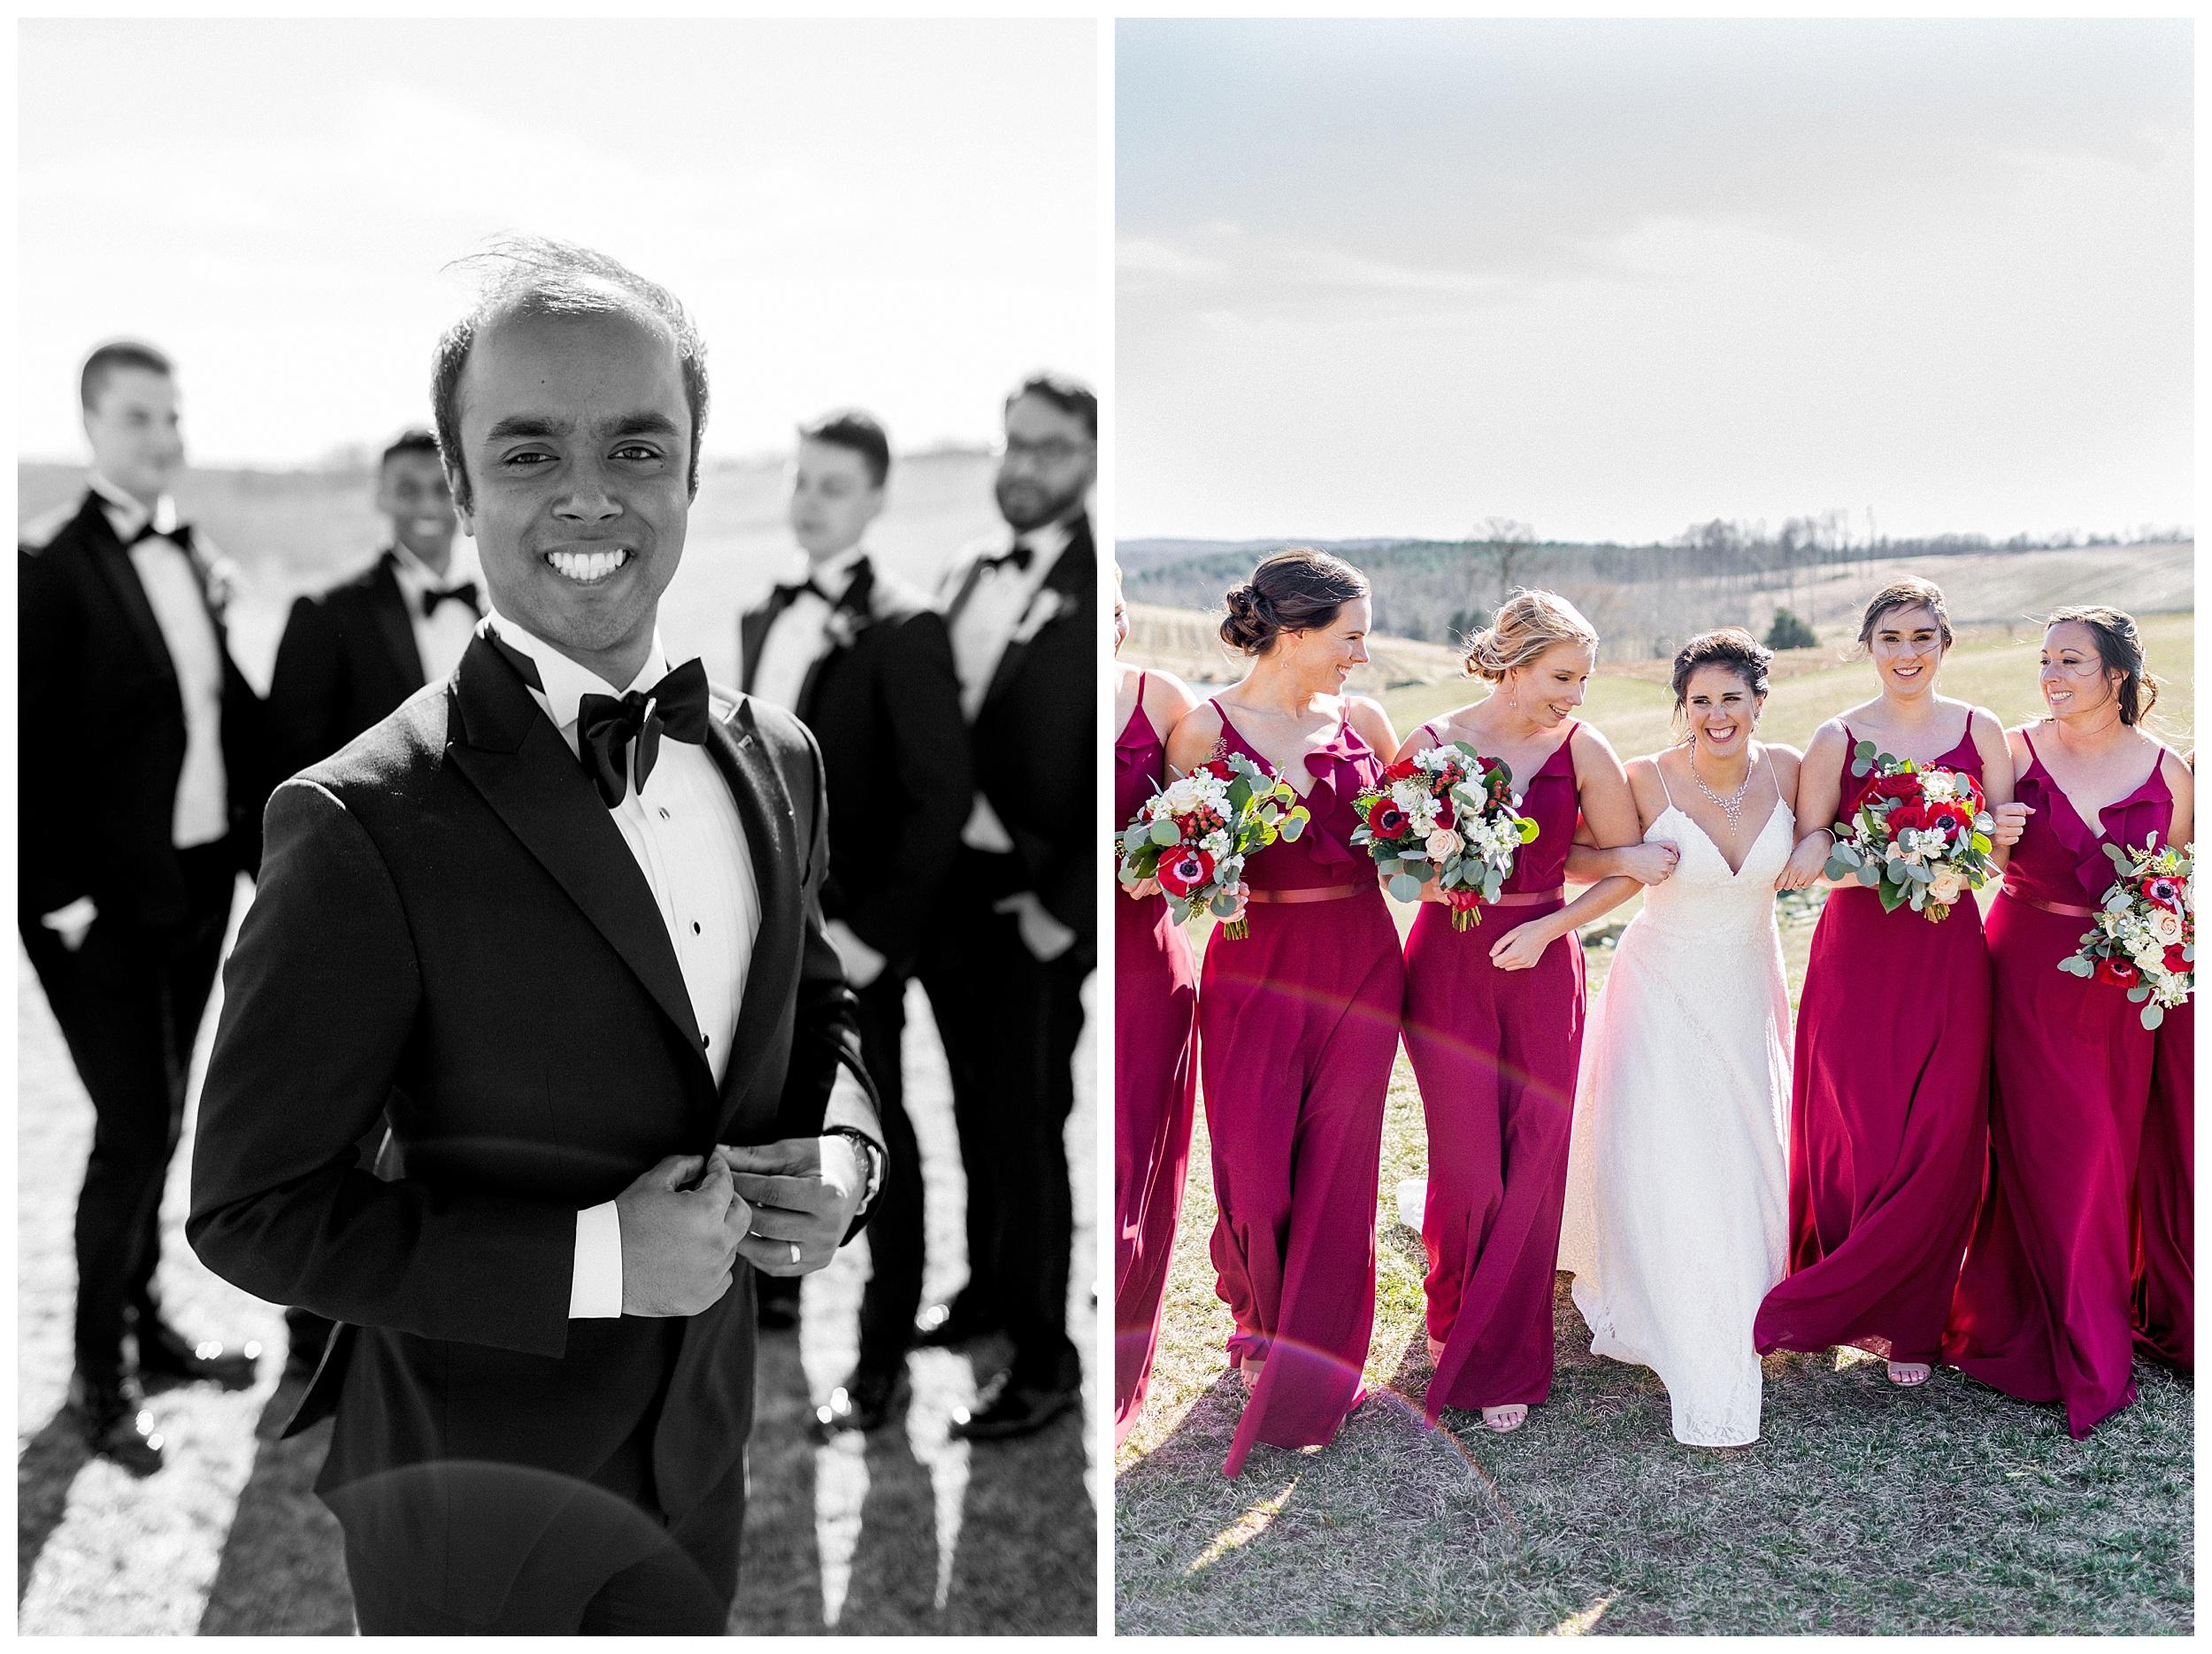 Stone Tower Winery Wedding | Virginia Winter Wedding | VA Wedding Photographer Kir Tuben_0064.jpg